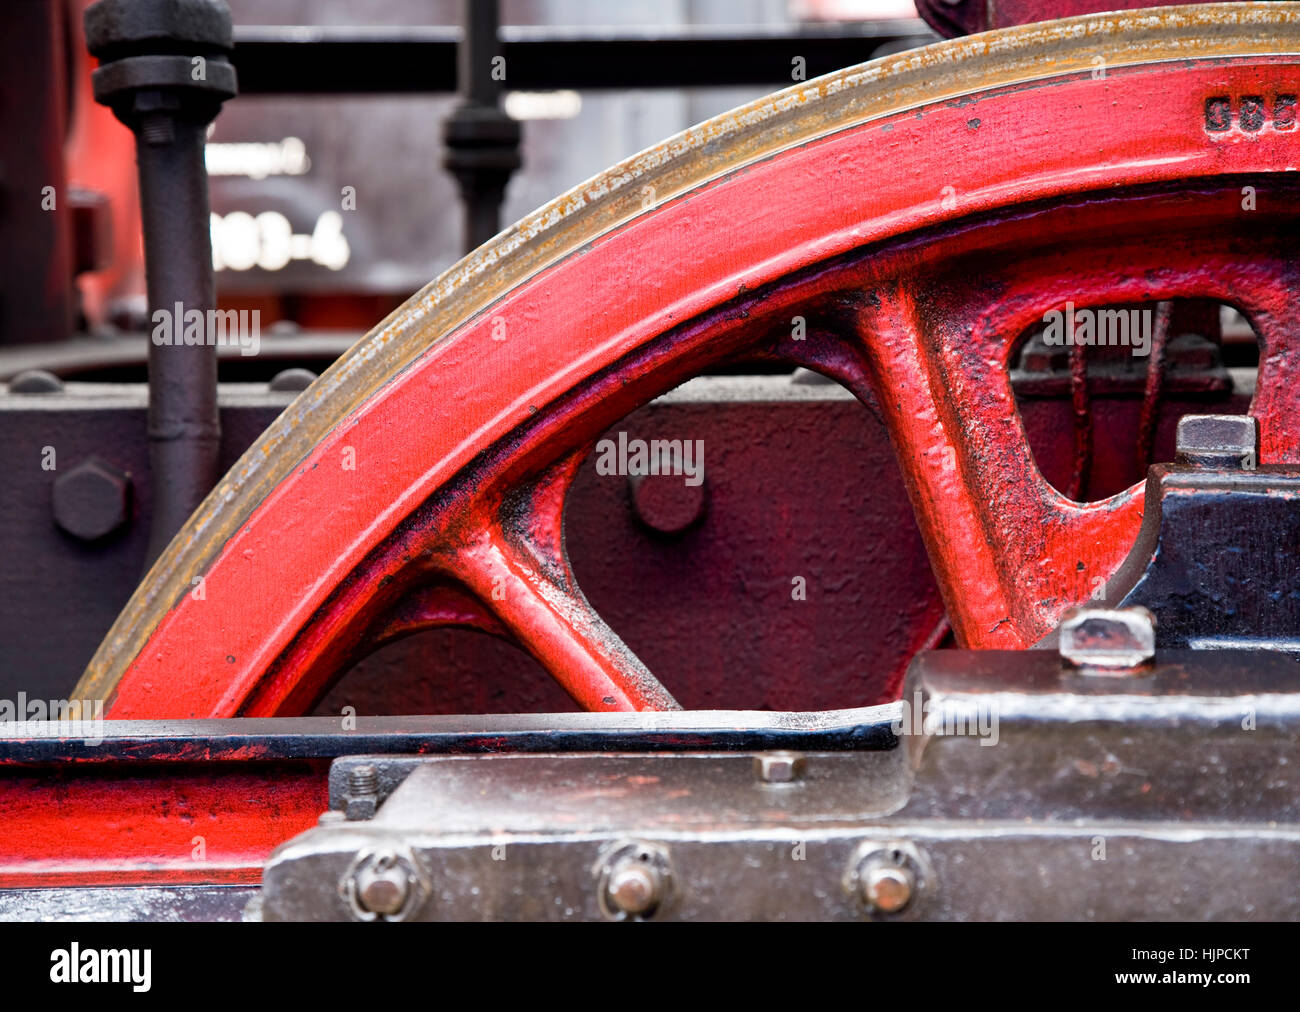 railway, locomotive, train, engine, rolling stock, vehicle, means of travel, Stock Photo